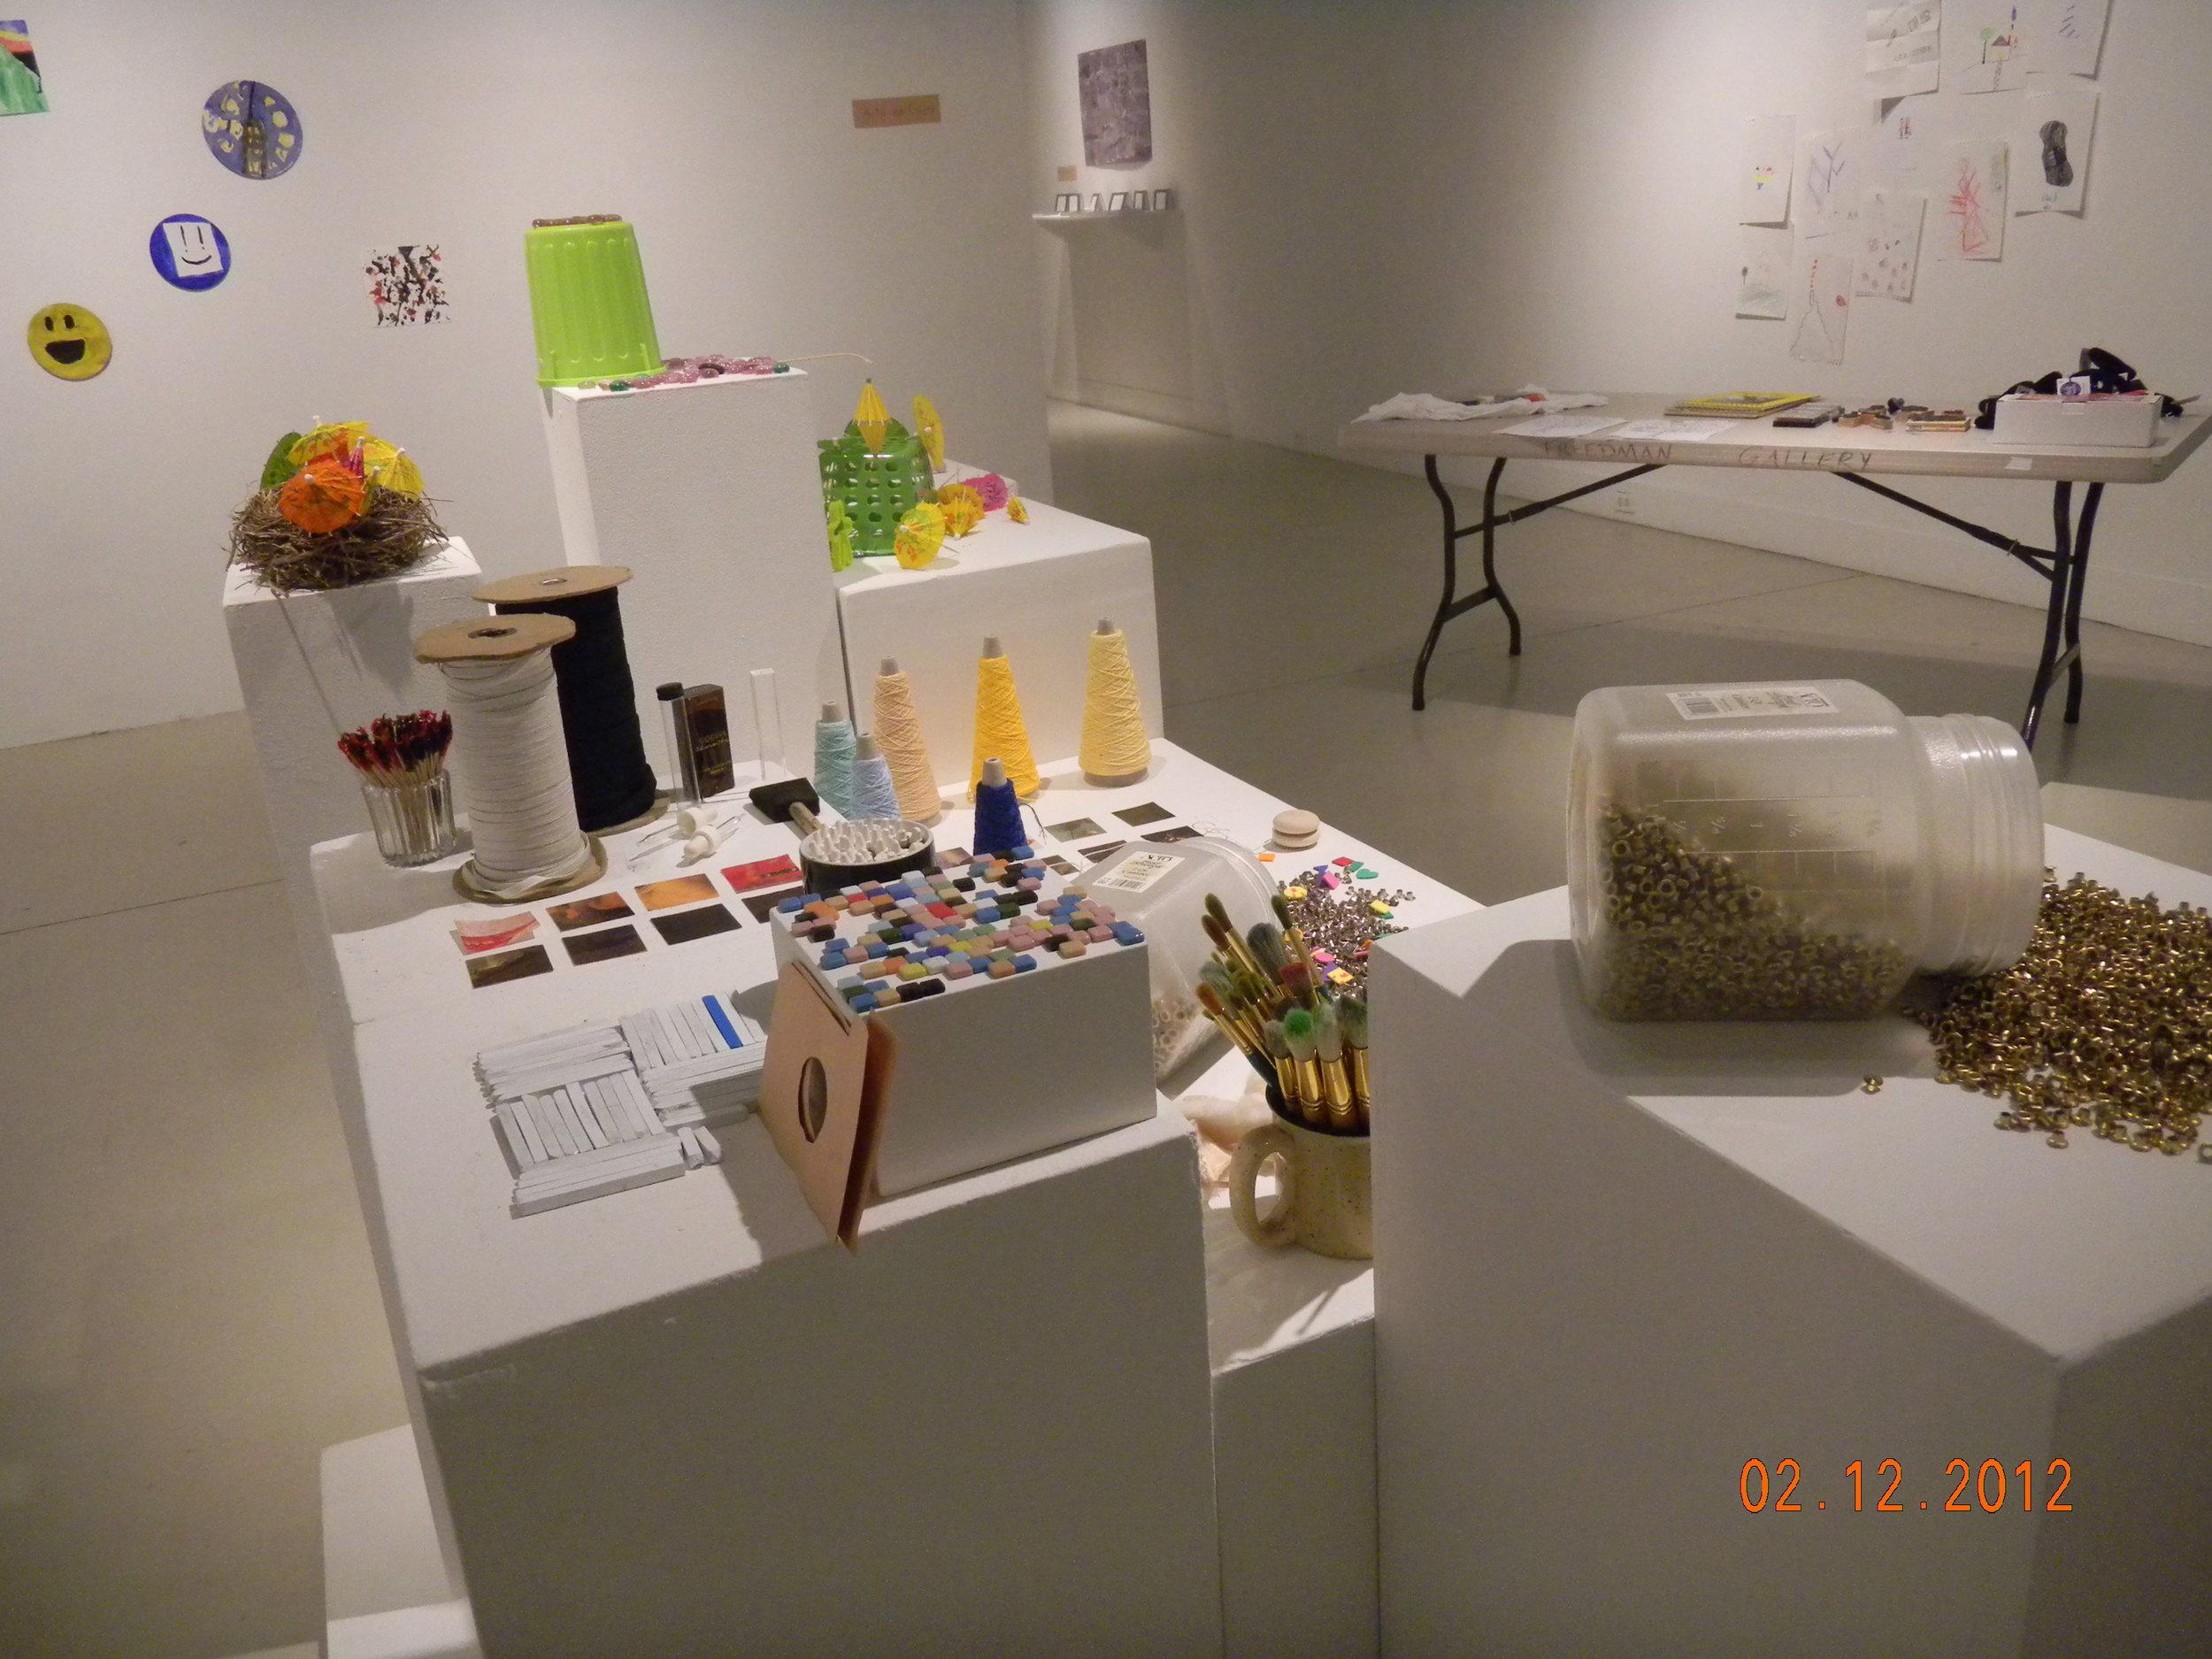 Iinstallation kids art in gallery from juried exhibition